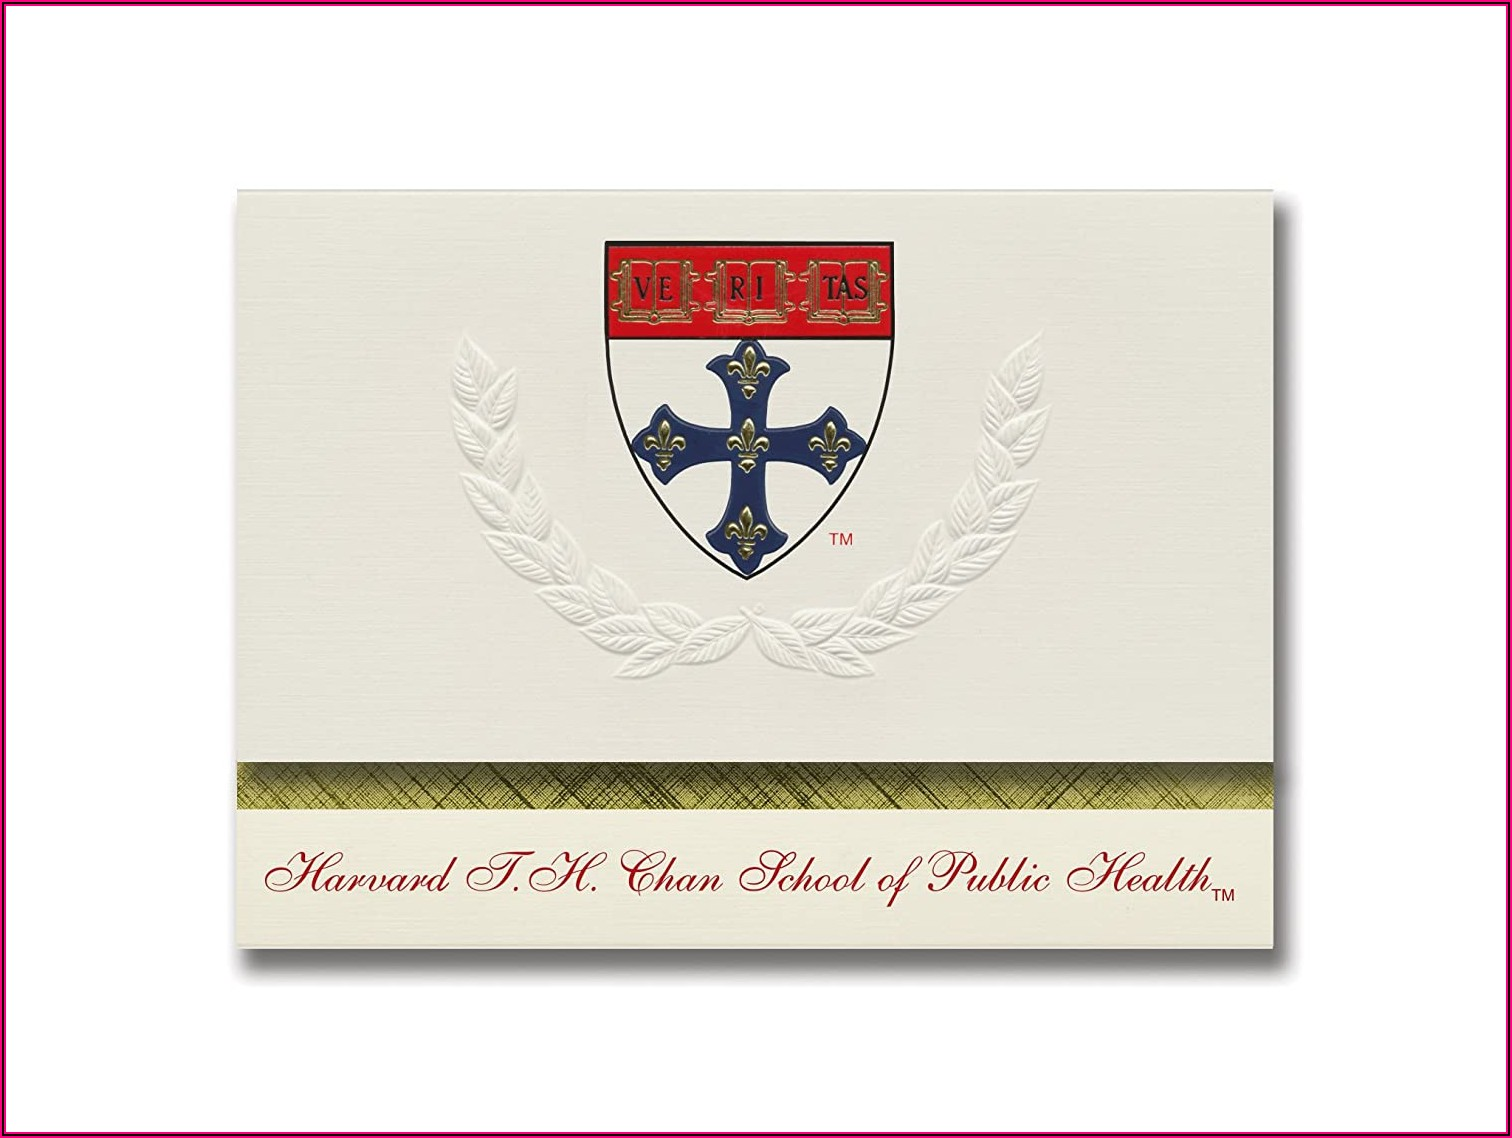 Harvard University Graduation Announcements